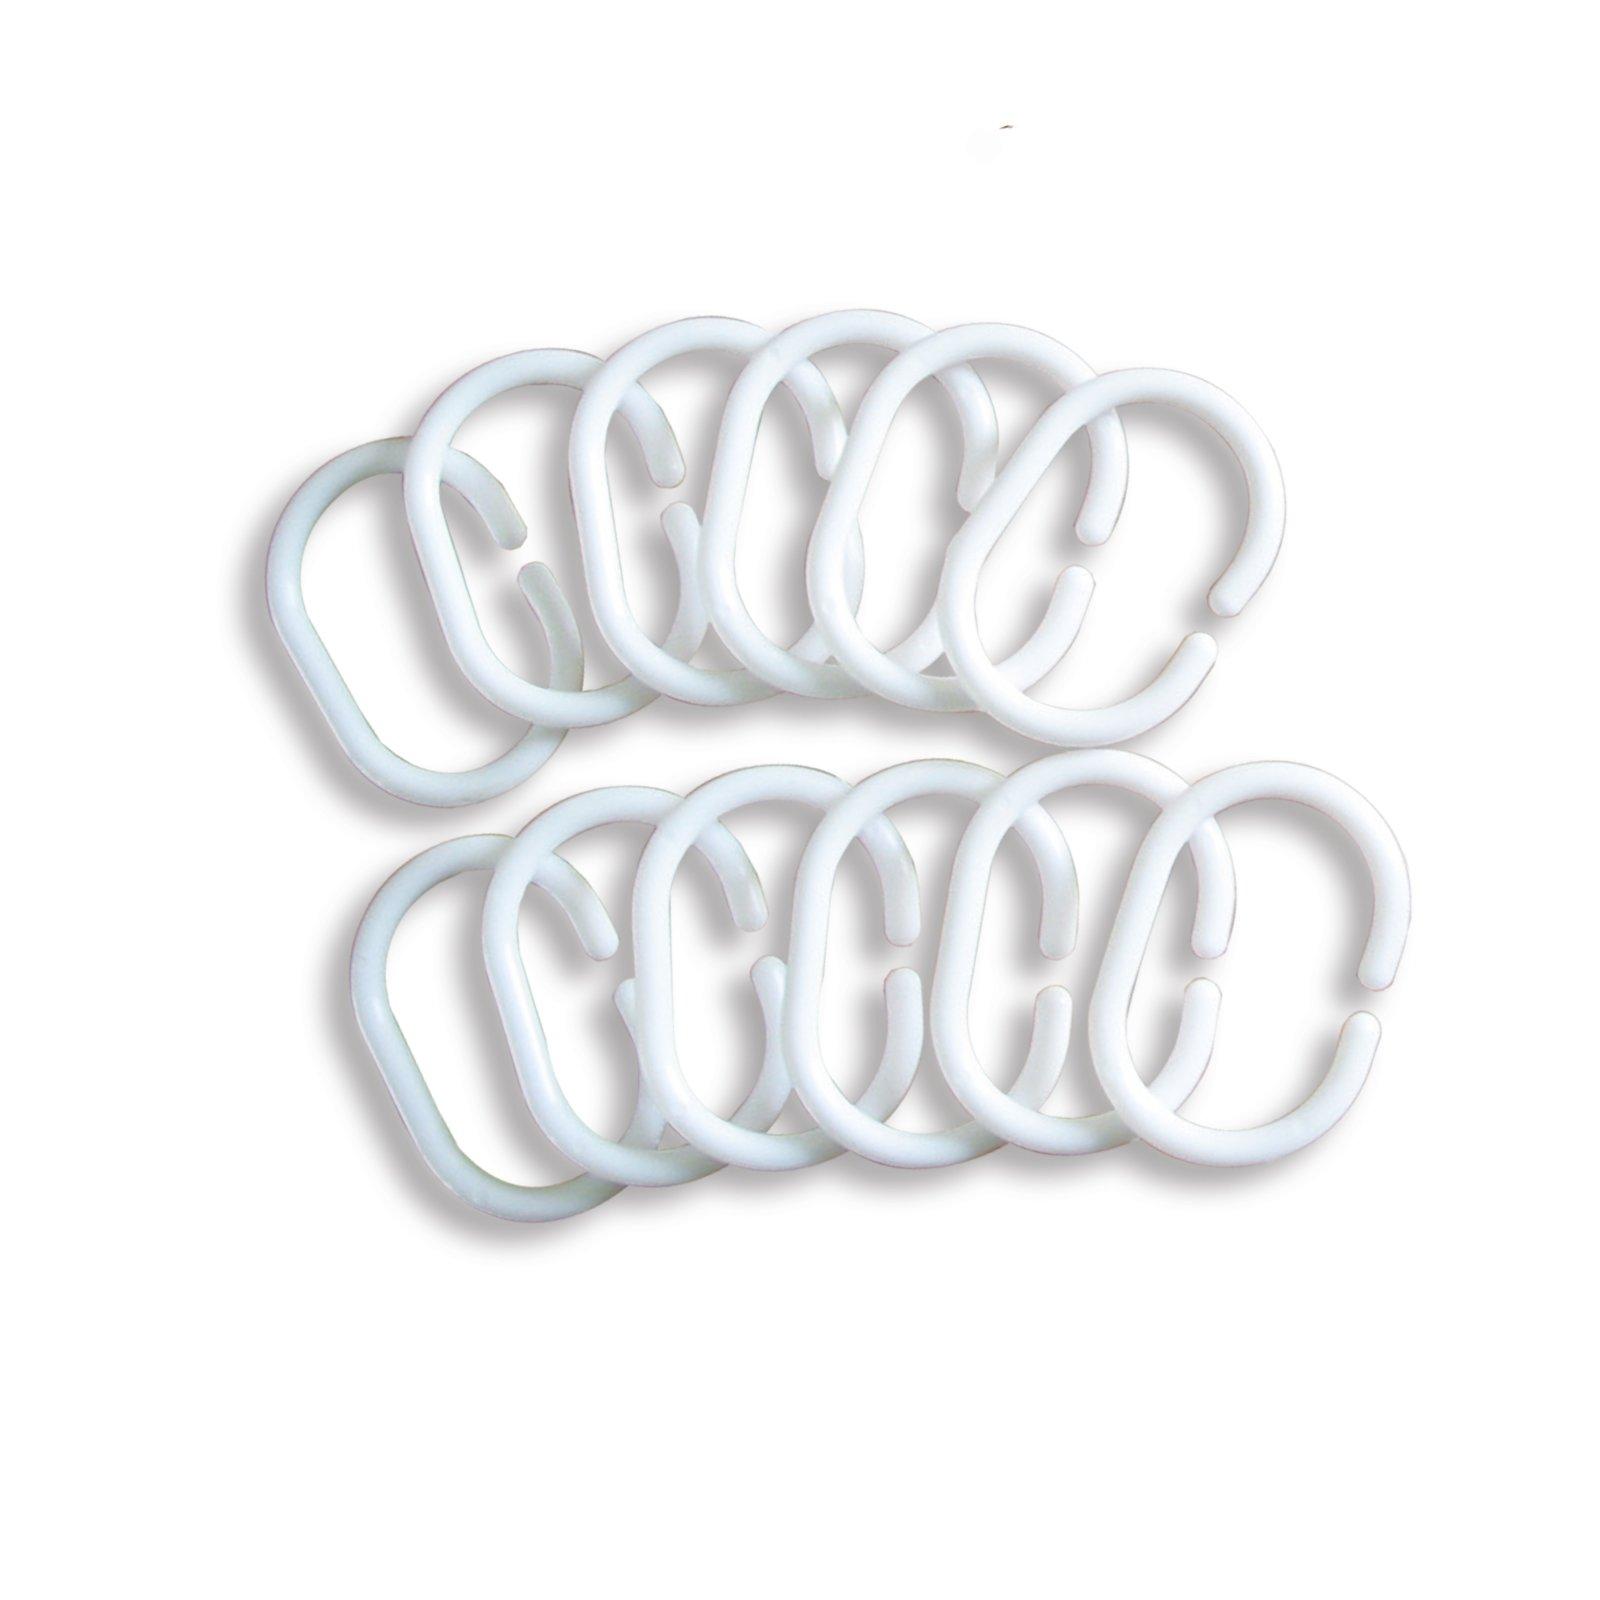 12er pack ringe wei kunststoff gardinenstangen gardinen zubeh r gardinen vorh nge. Black Bedroom Furniture Sets. Home Design Ideas